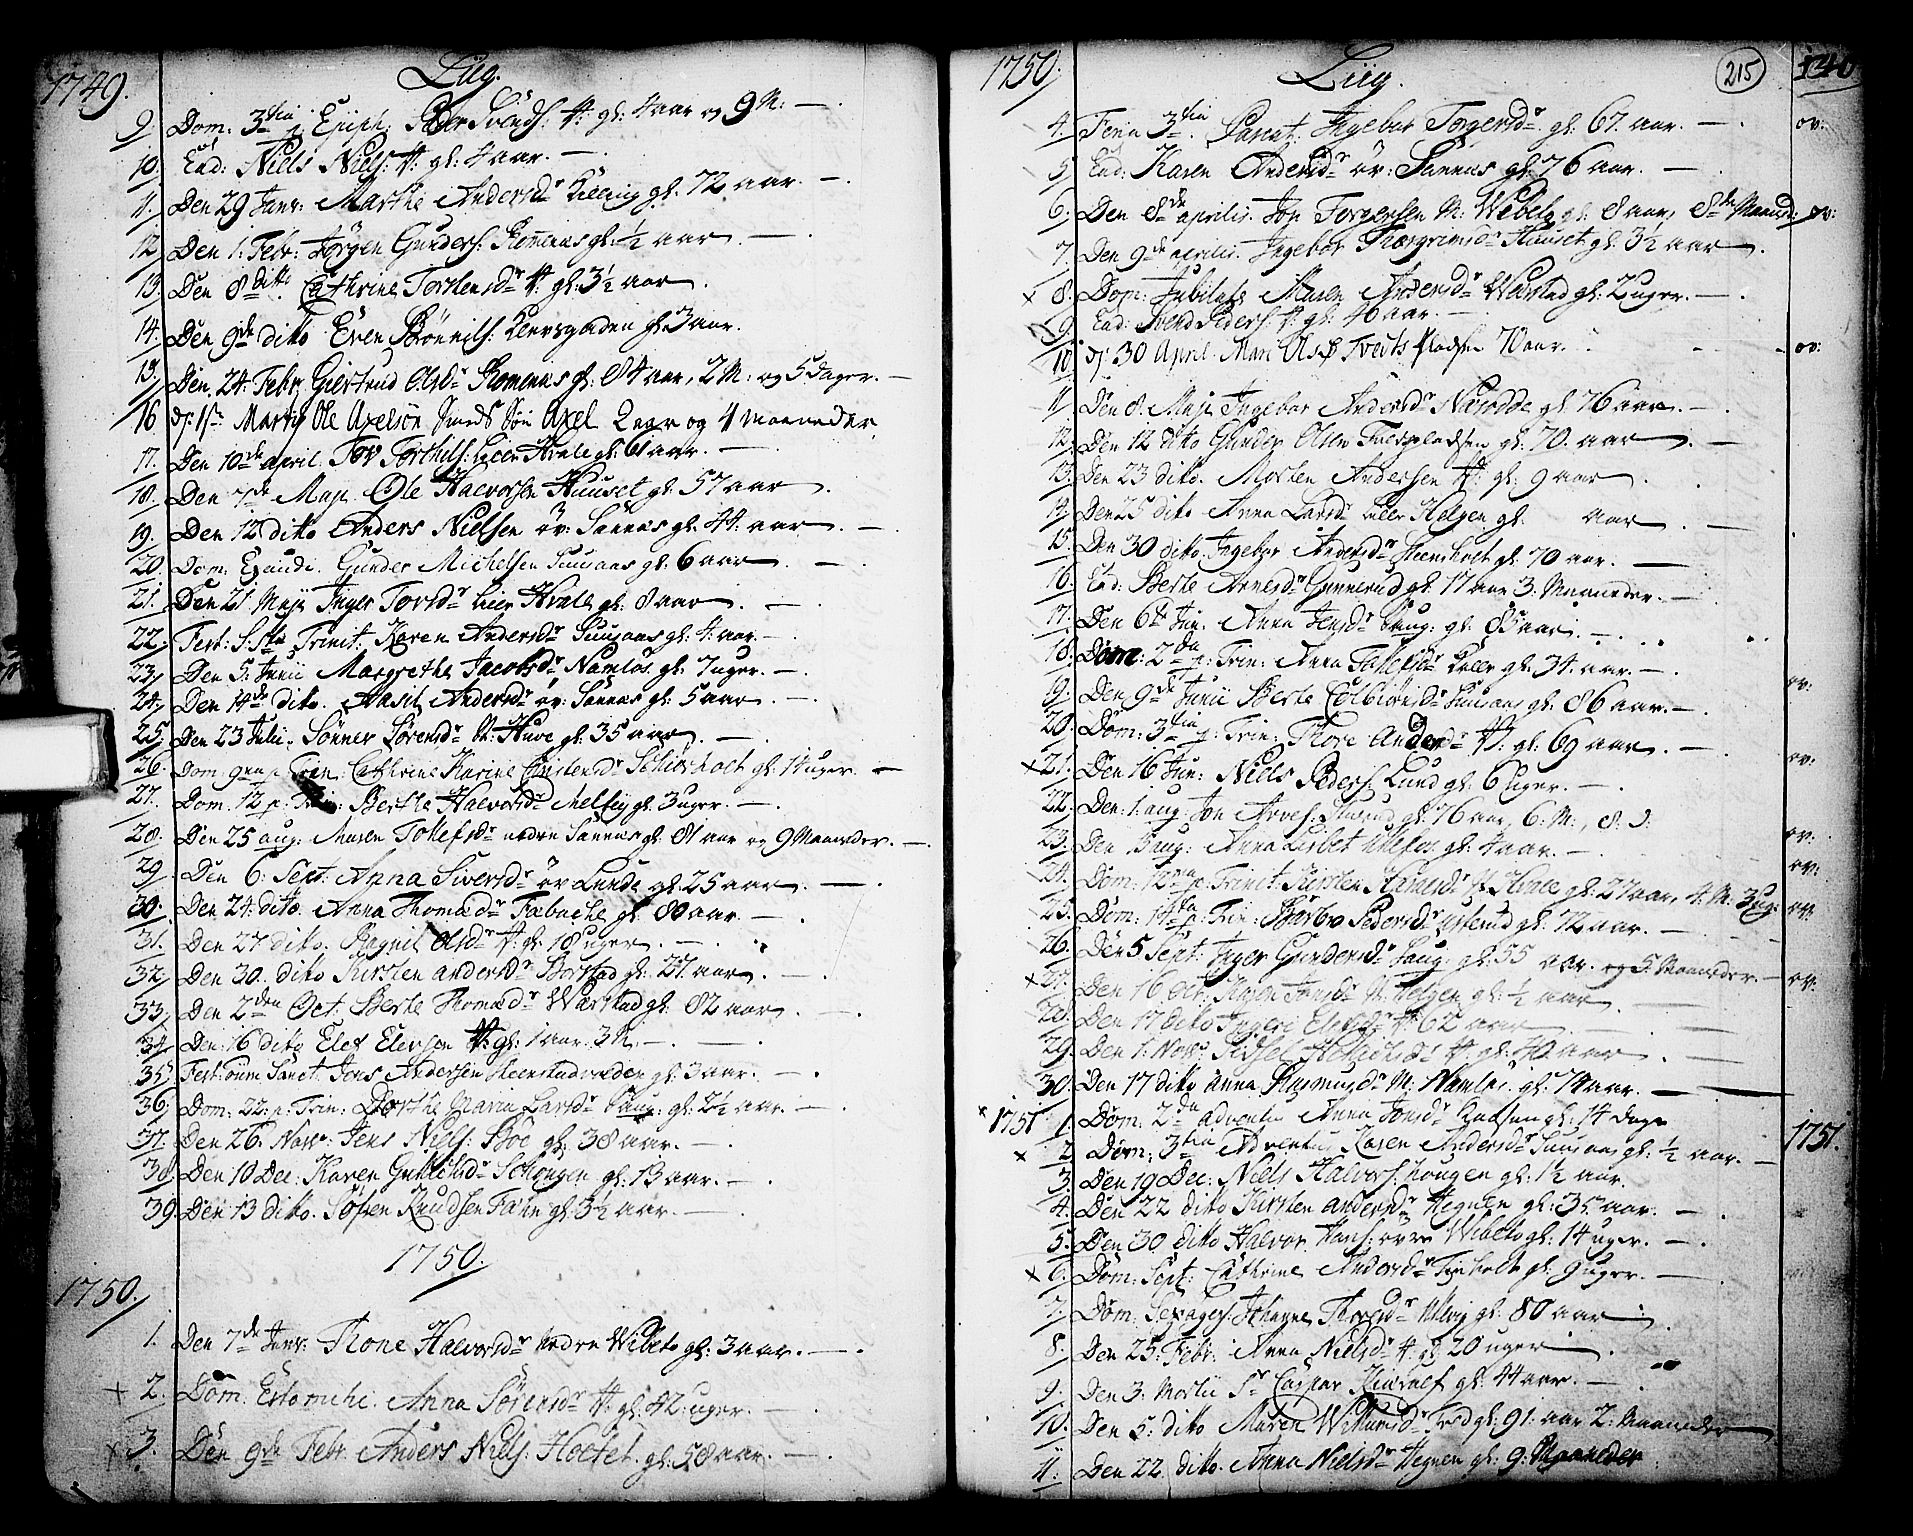 SAKO, Holla kirkebøker, F/Fa/L0001: Ministerialbok nr. 1, 1717-1779, s. 215